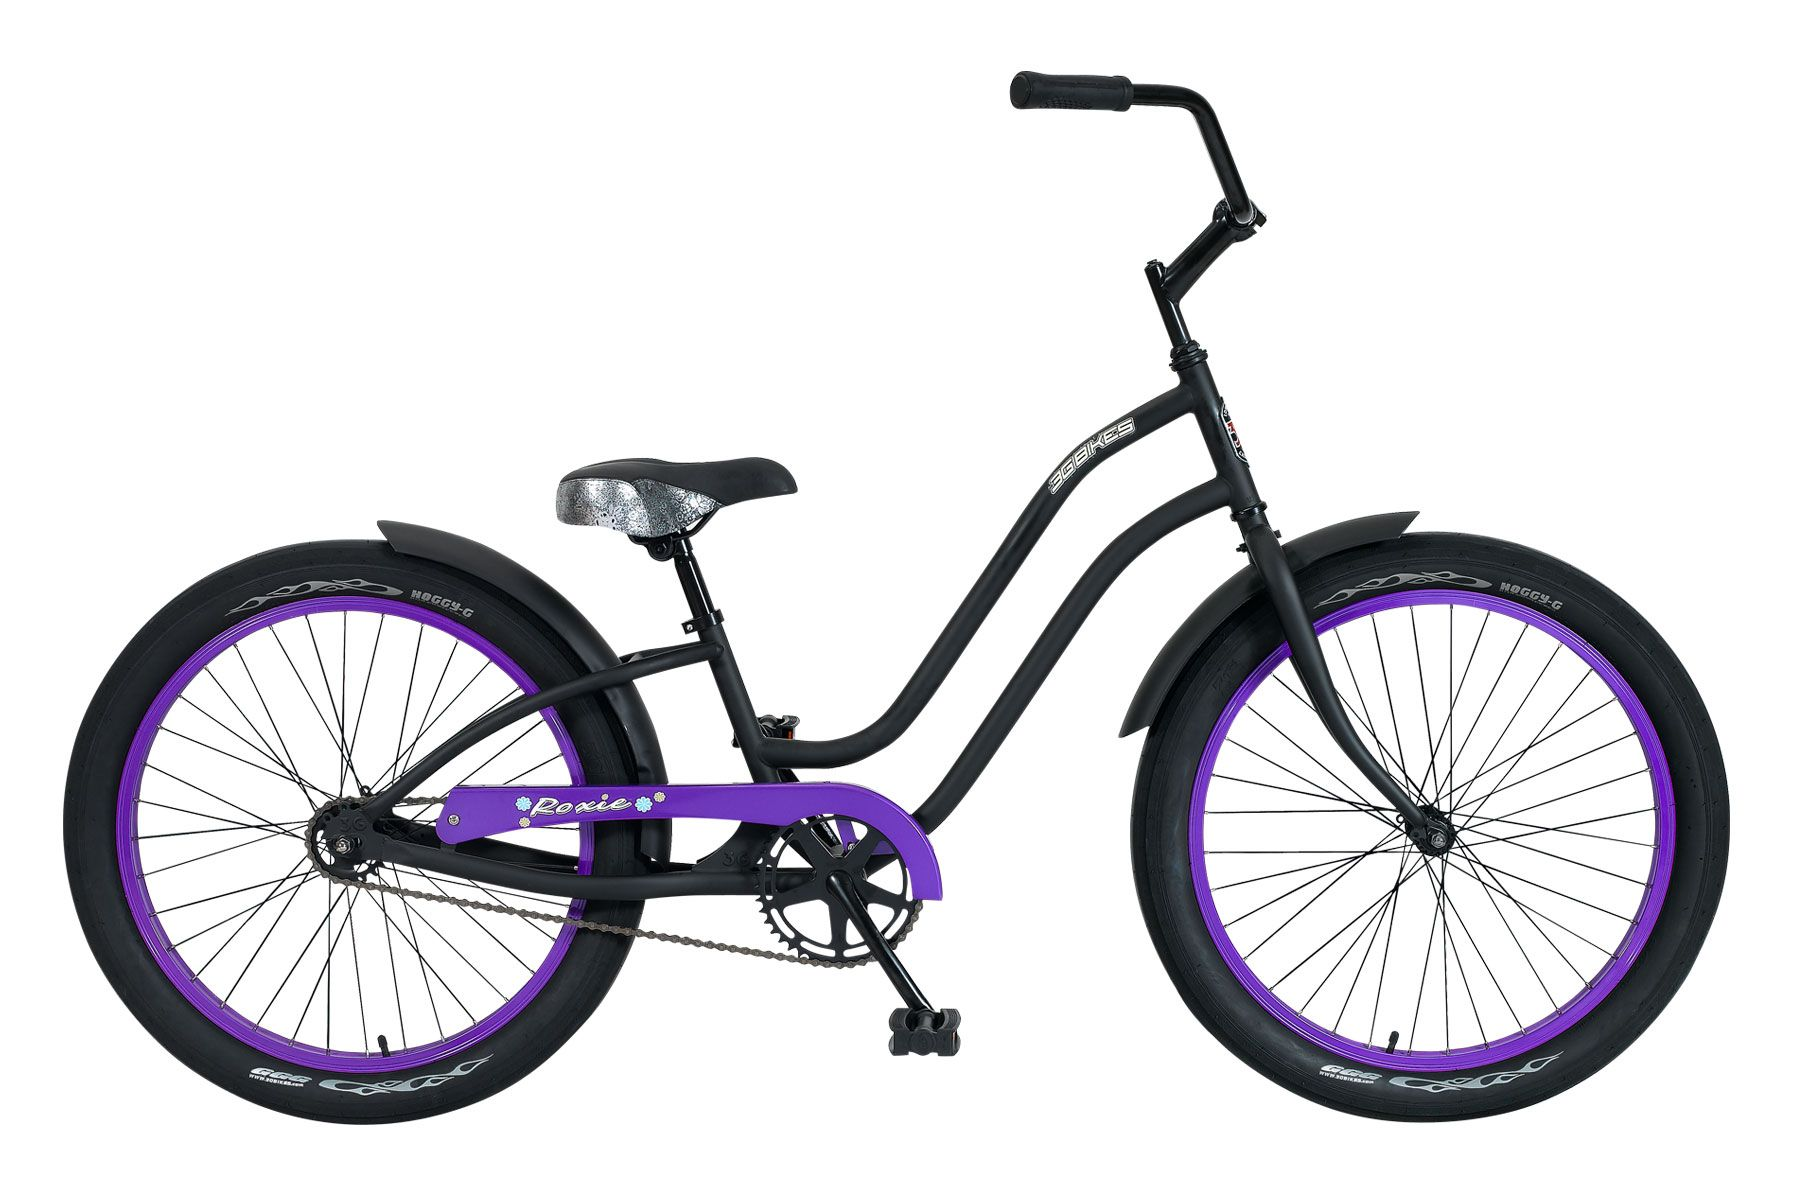 75e88eb7352 Girl s Roxie beach cruiser bicycle in black and purple. 24